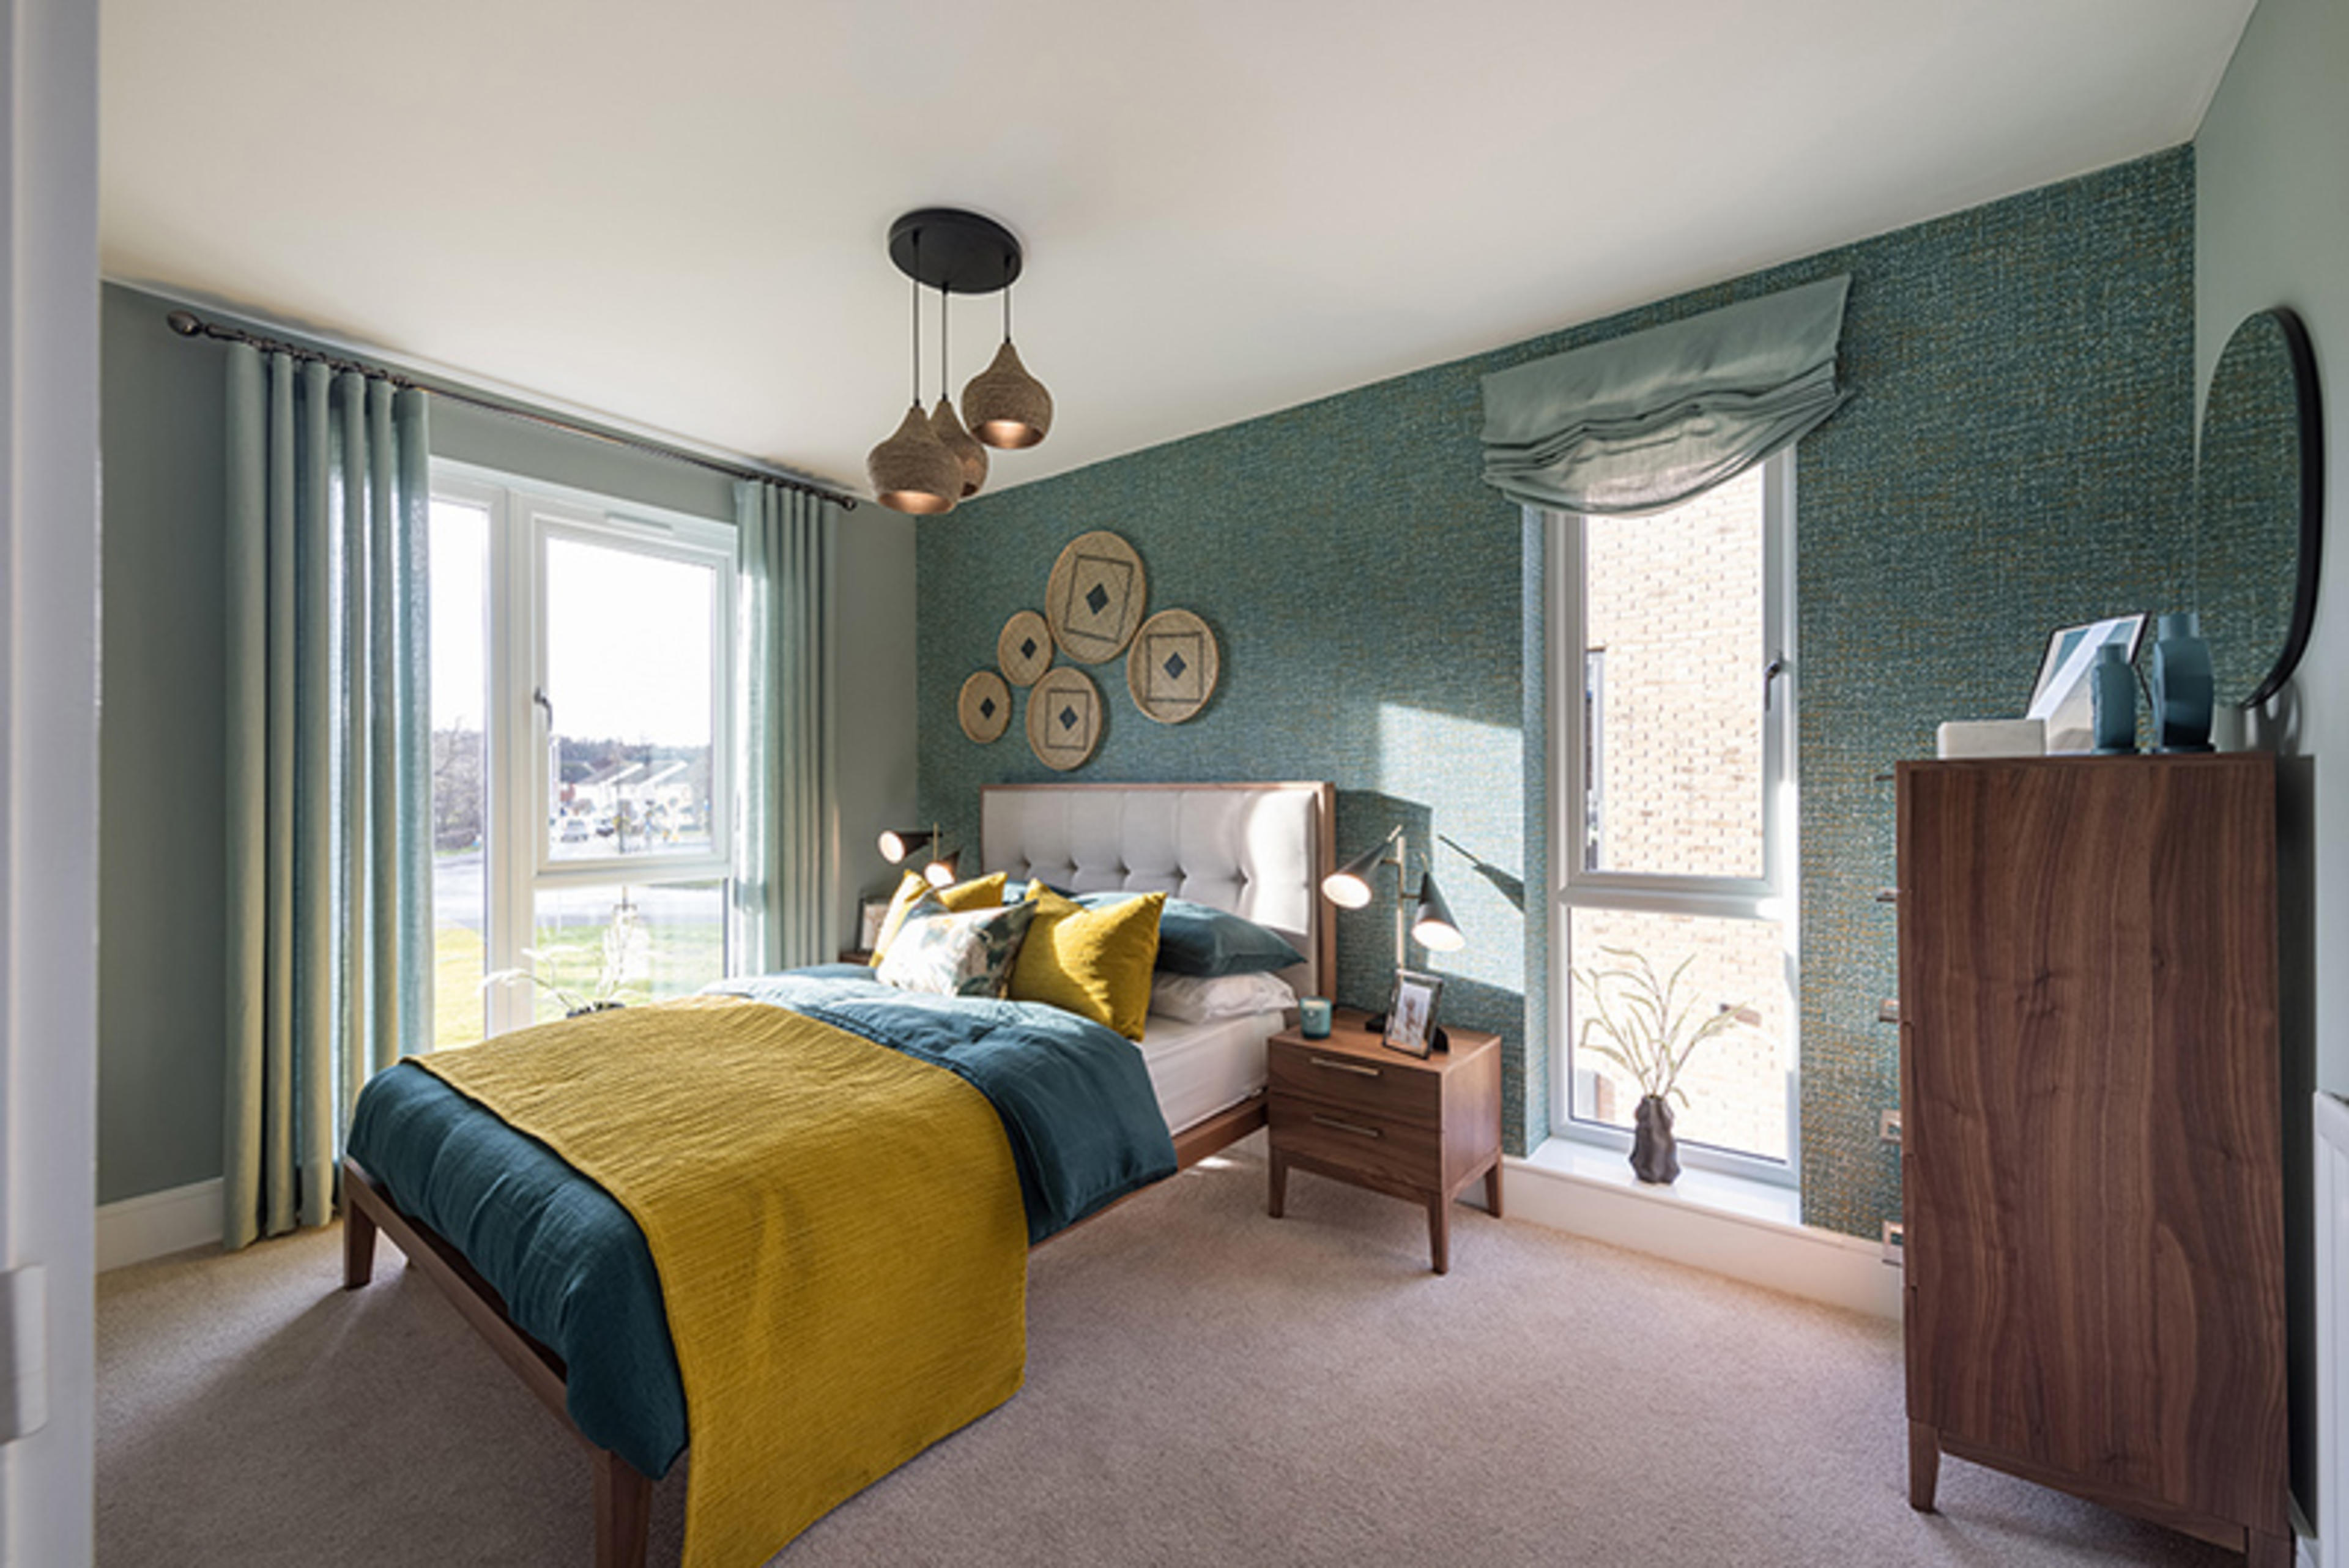 watling-grange-harrogate-easby-3-bed-home-master-bedroom-1